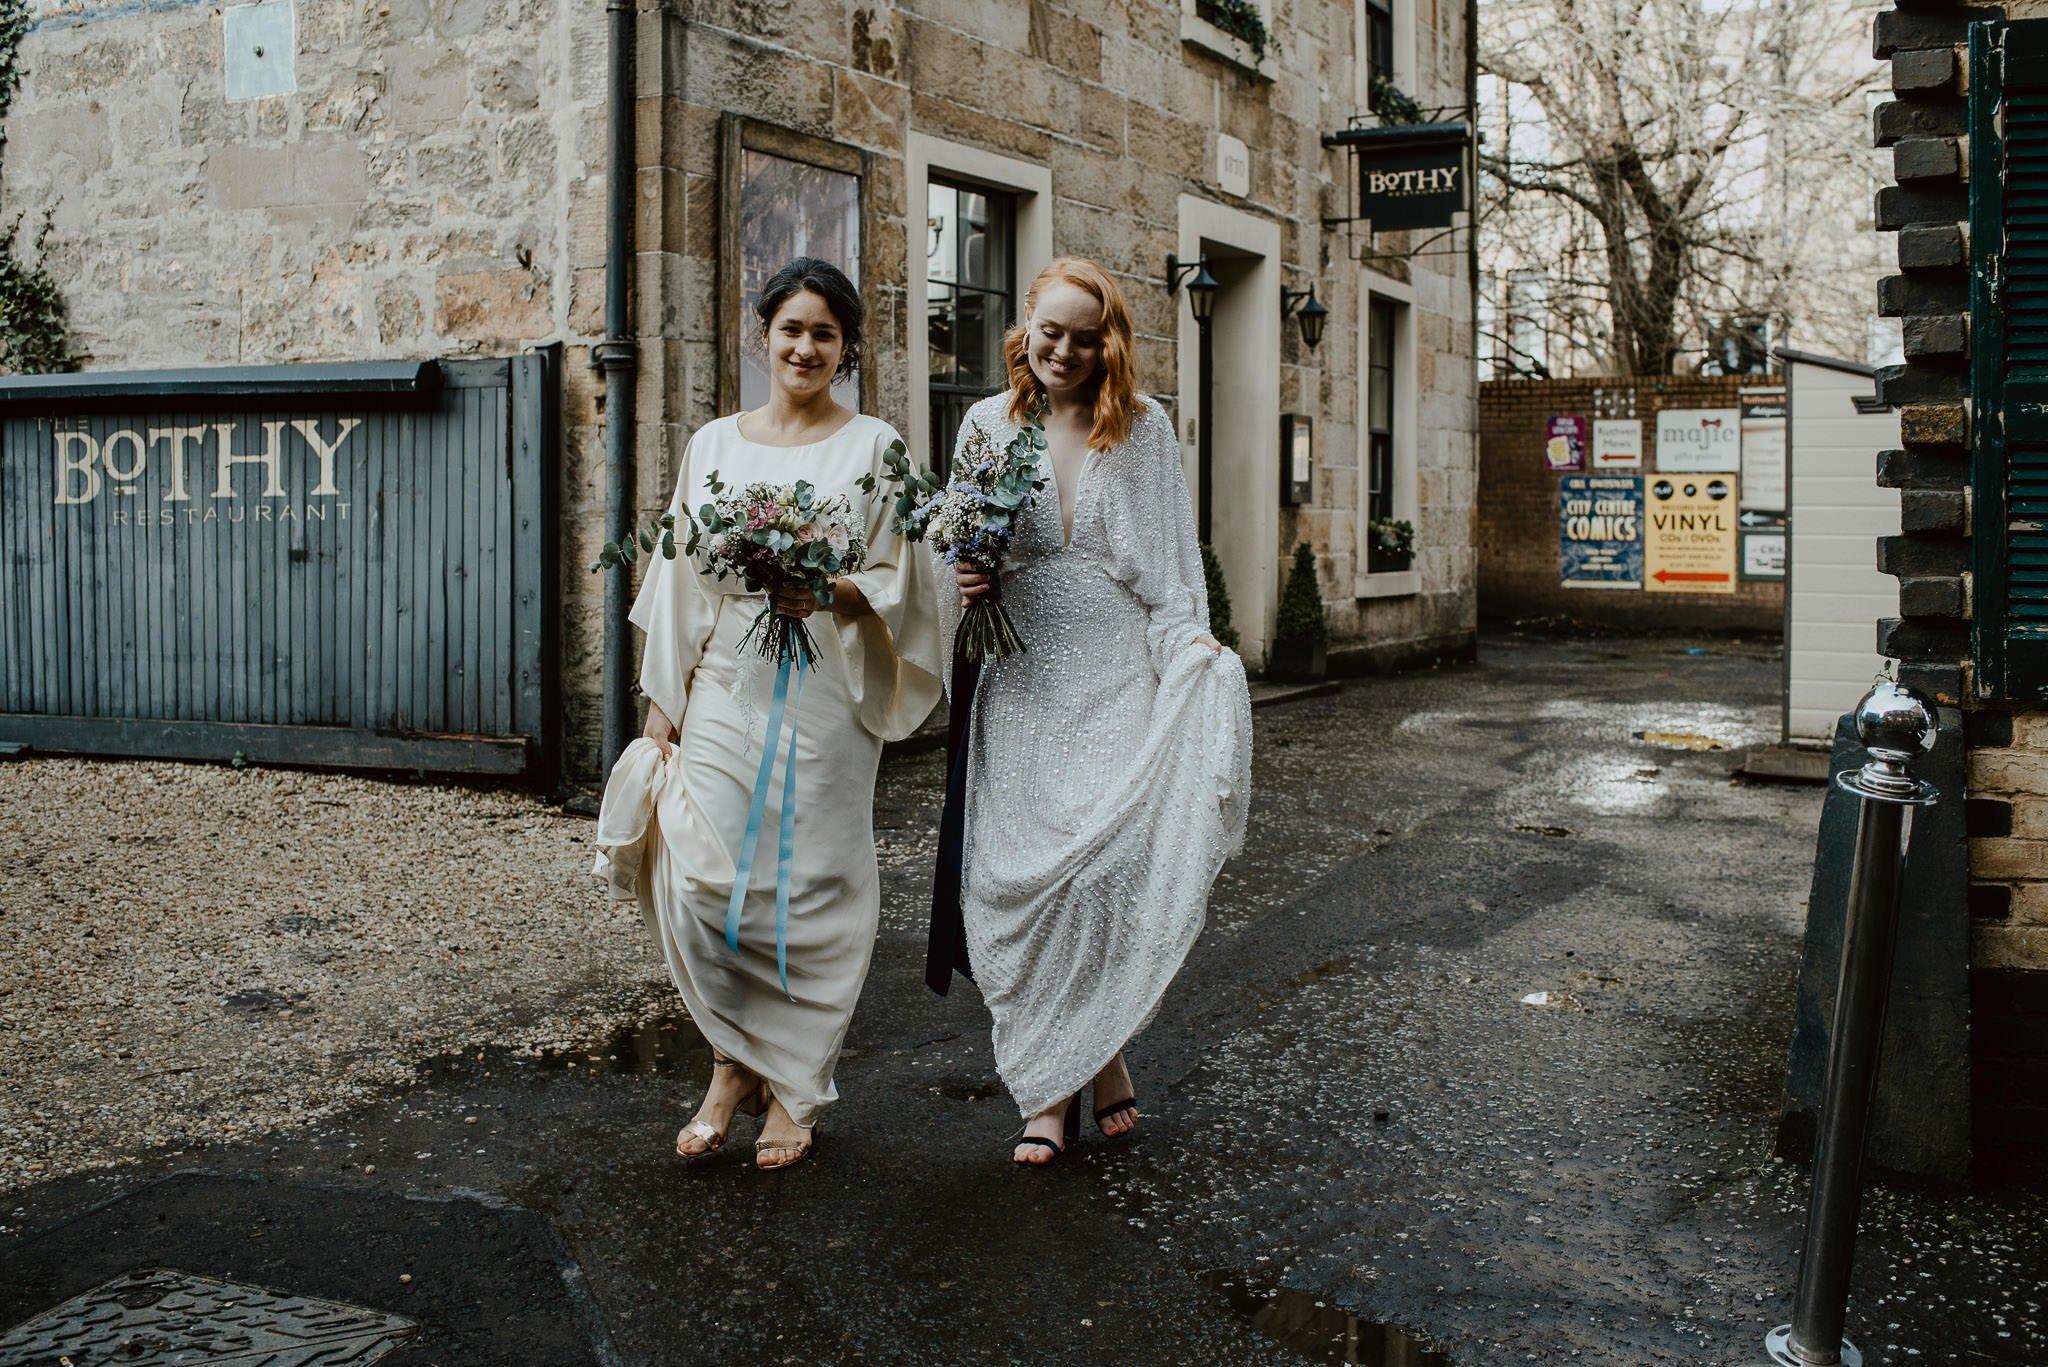 A Dreamy Pre-Raphaelite Wedding at the Bothy in Glasgow 34